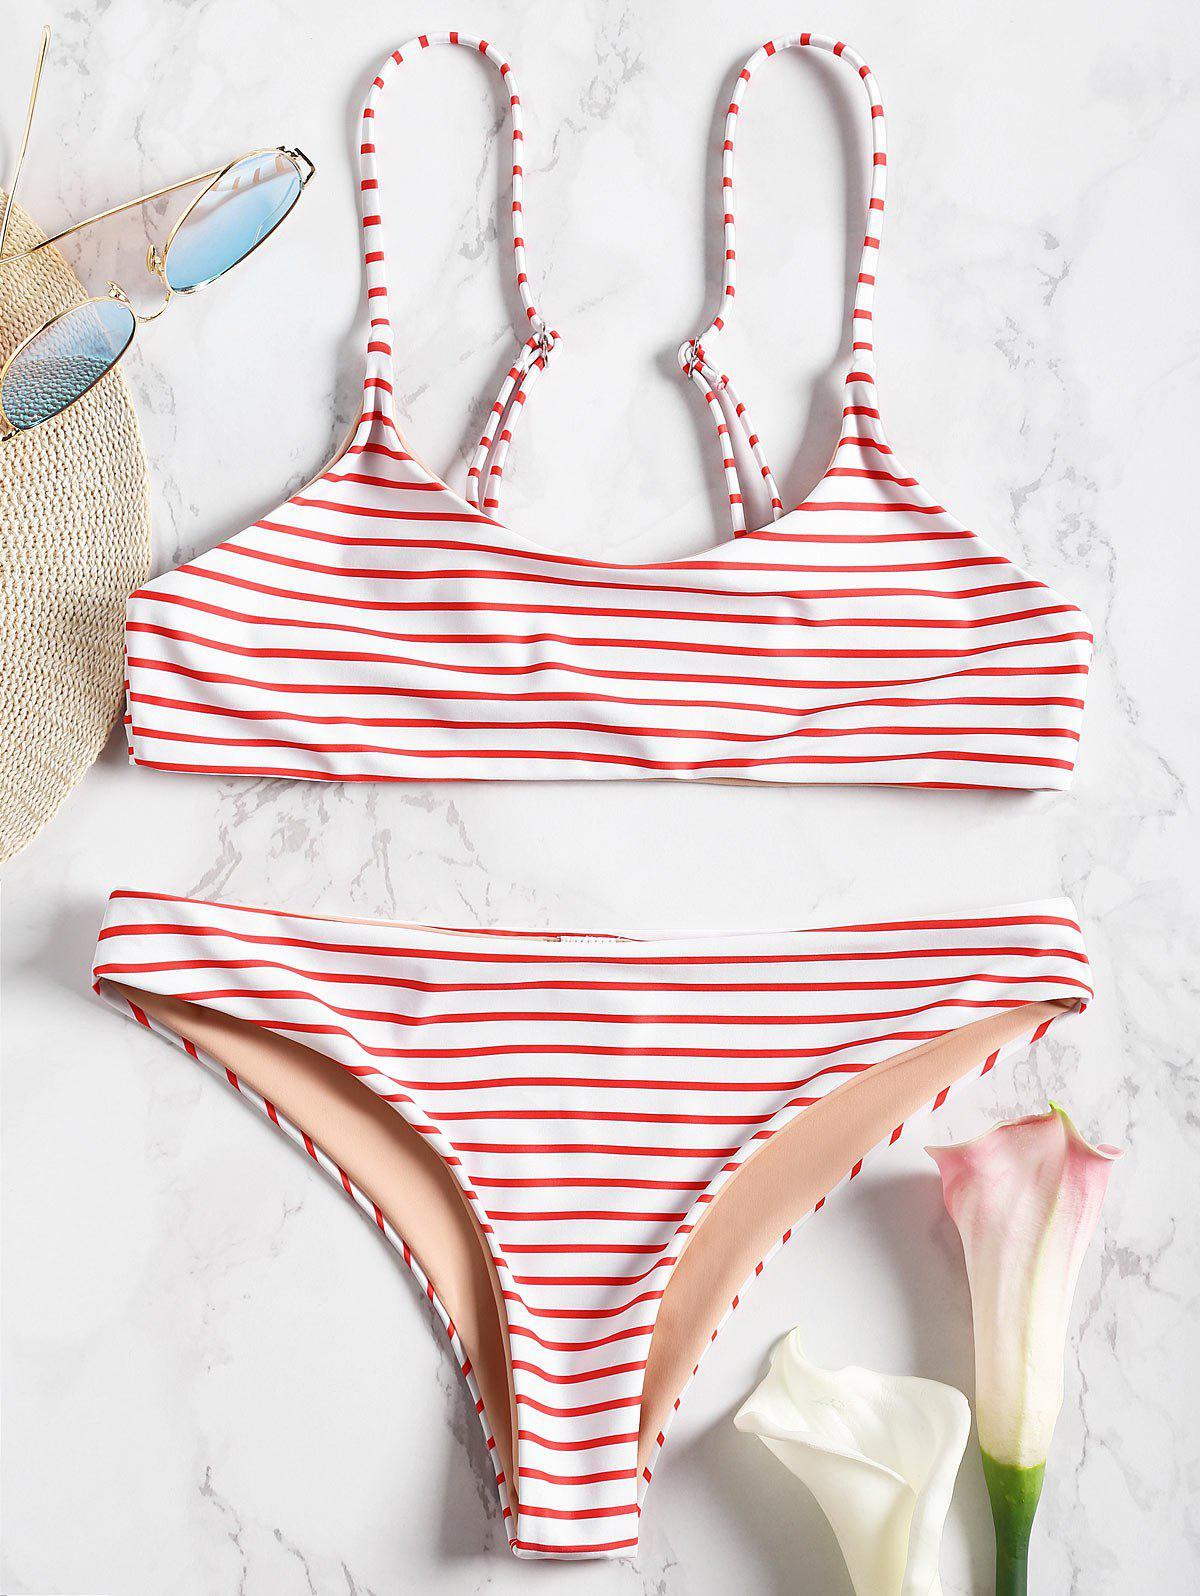 Cami Striped Bralette